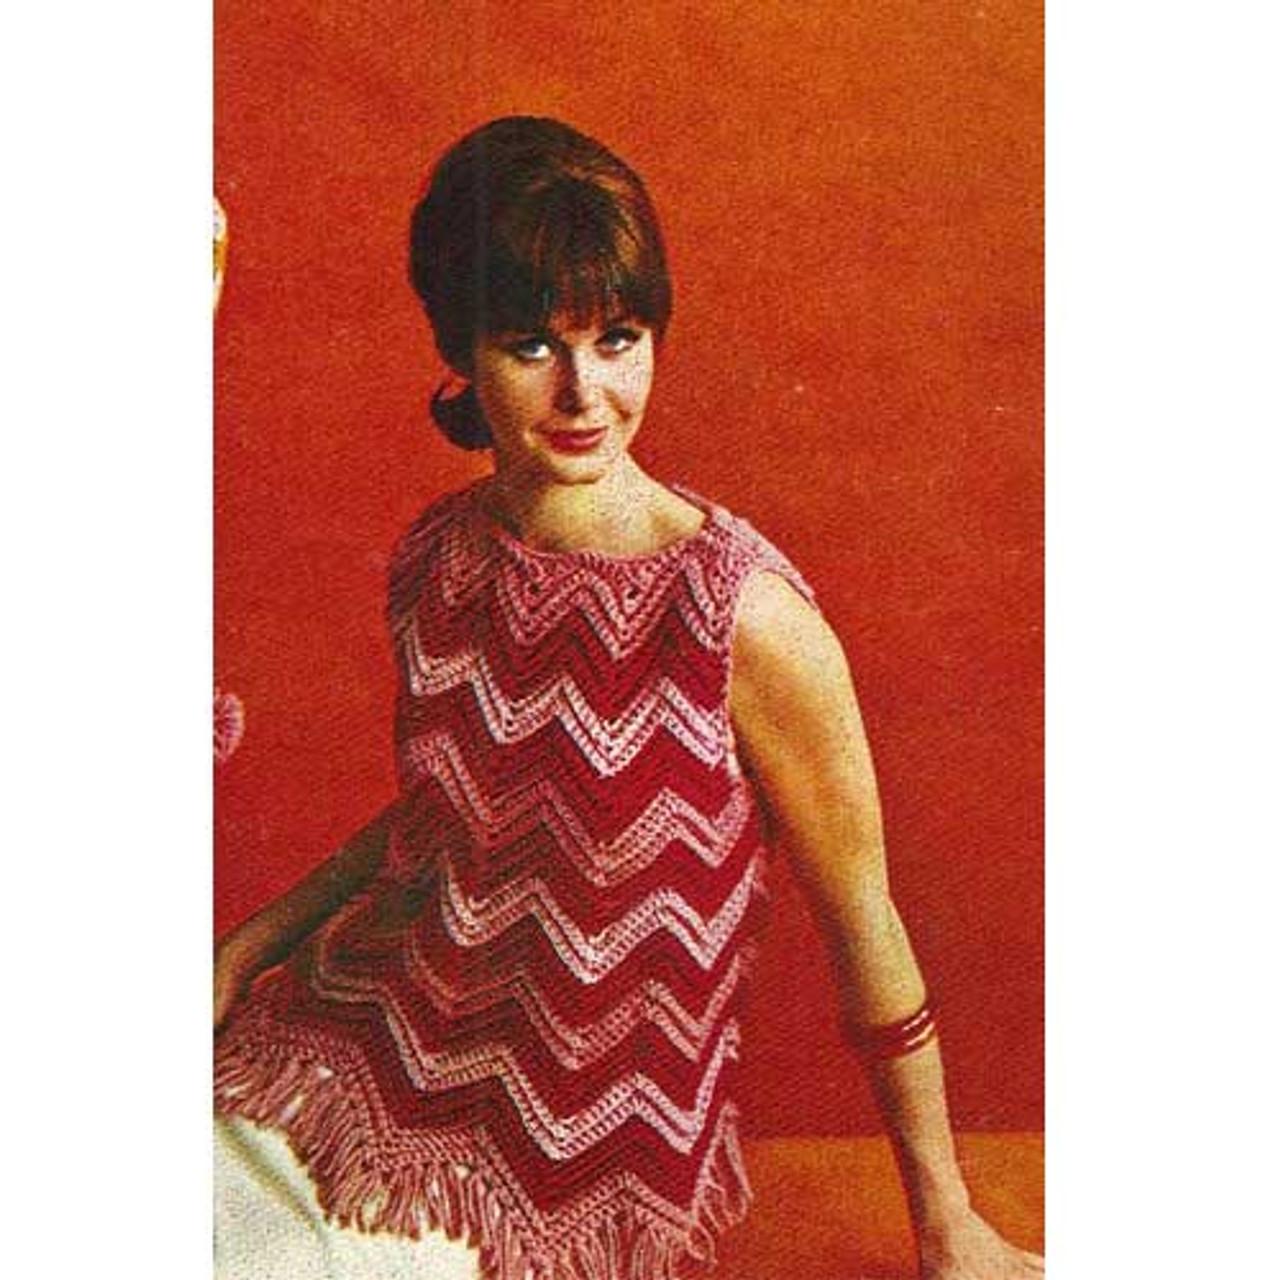 Ripple Crochet Sleeveless Top Pattern